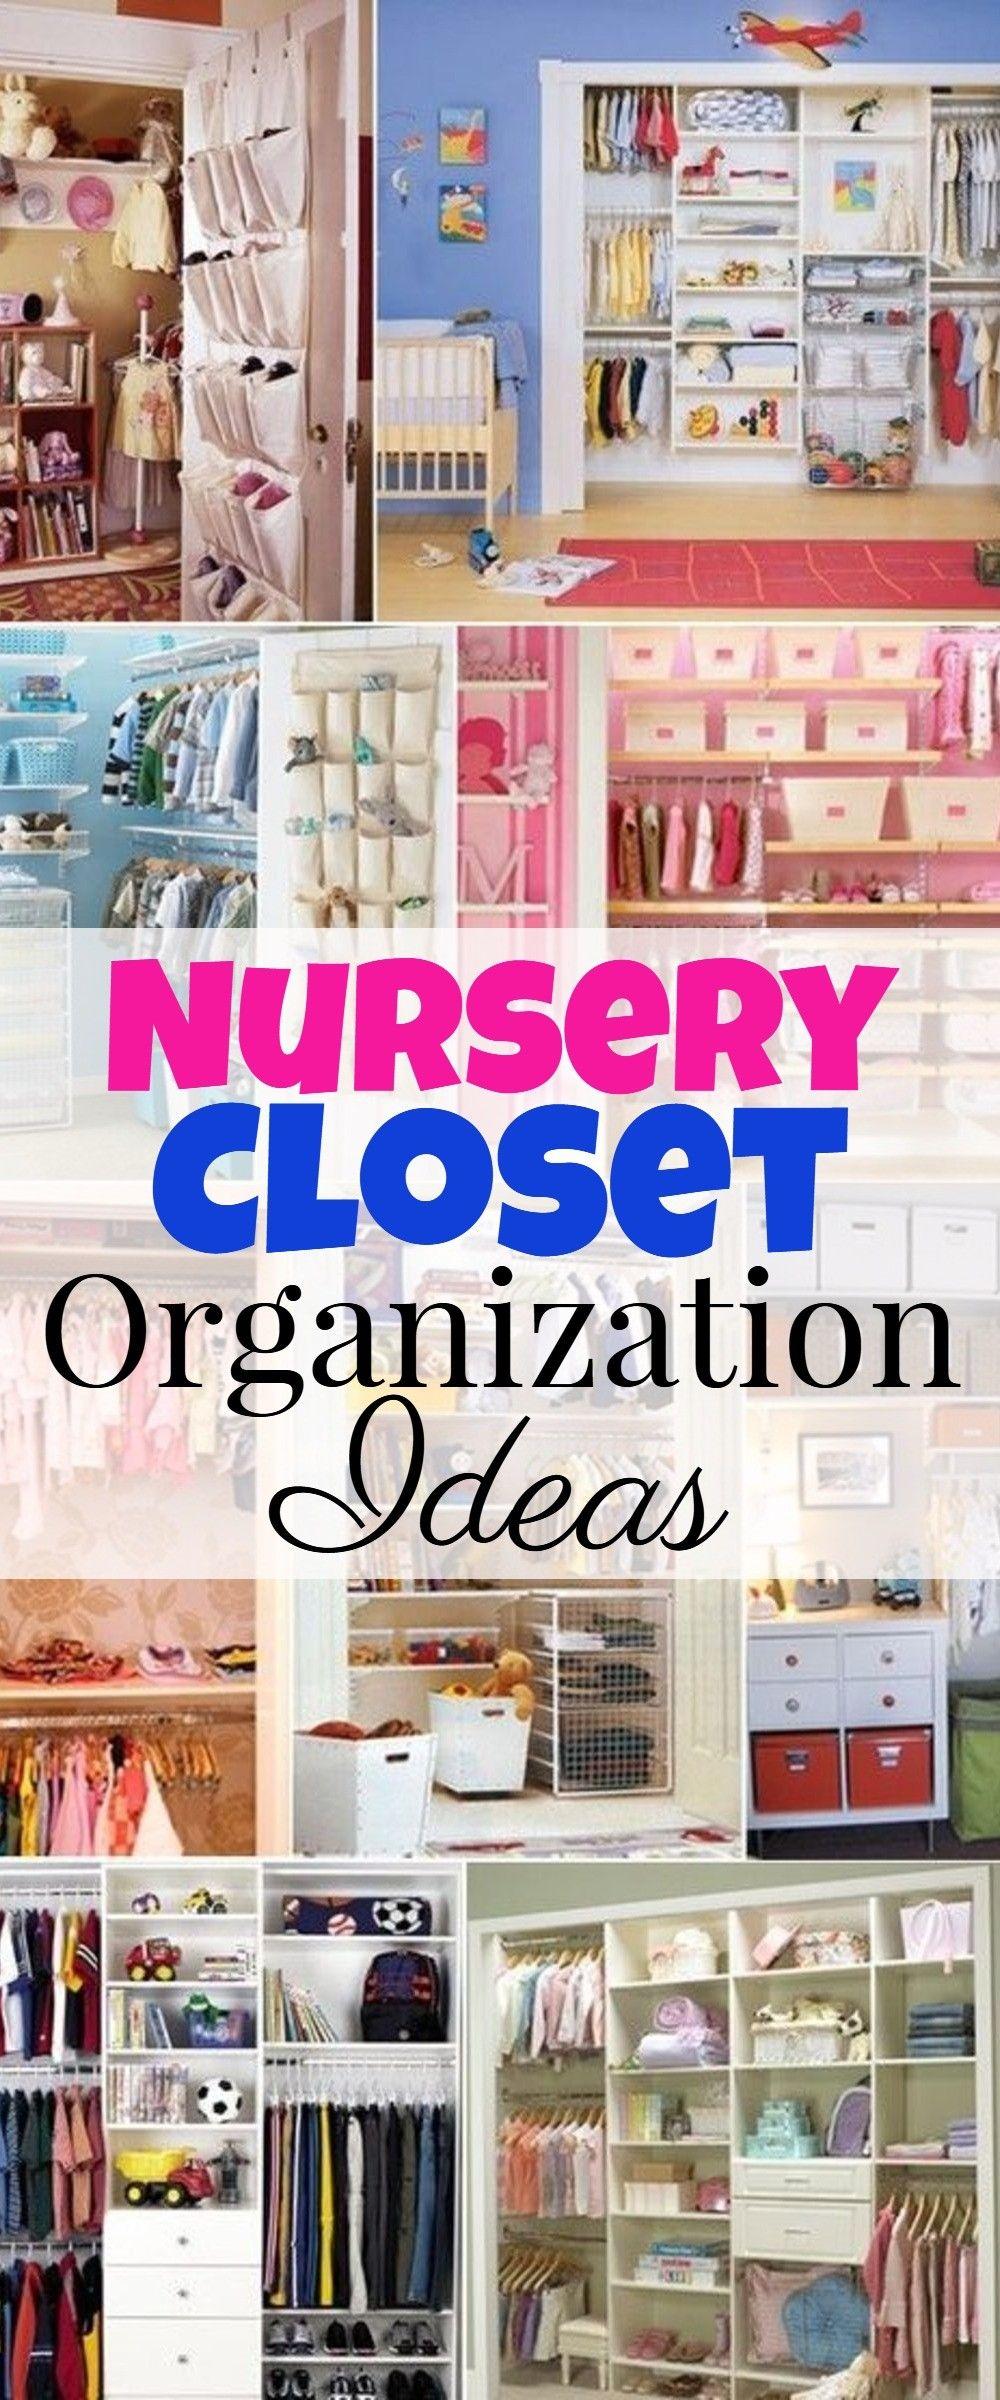 Nursery closet organization tips and ideas - great hacks, easy DIY ideas, and…